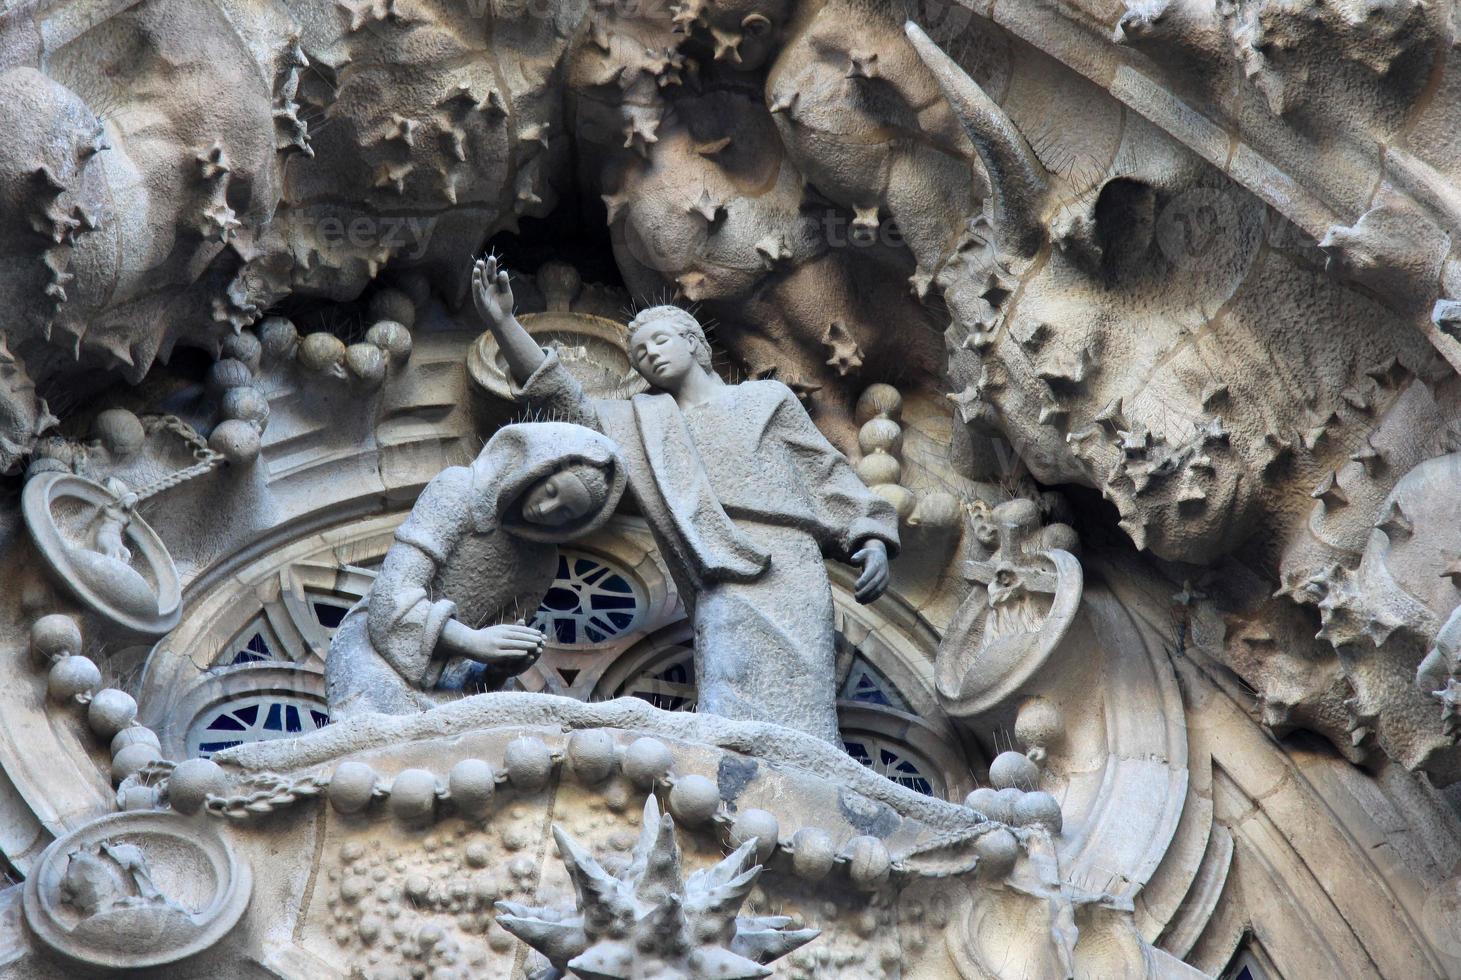 Krippenfassade des Sagrada Familia Tempels, Barcelona, Katalonien, Spanien foto